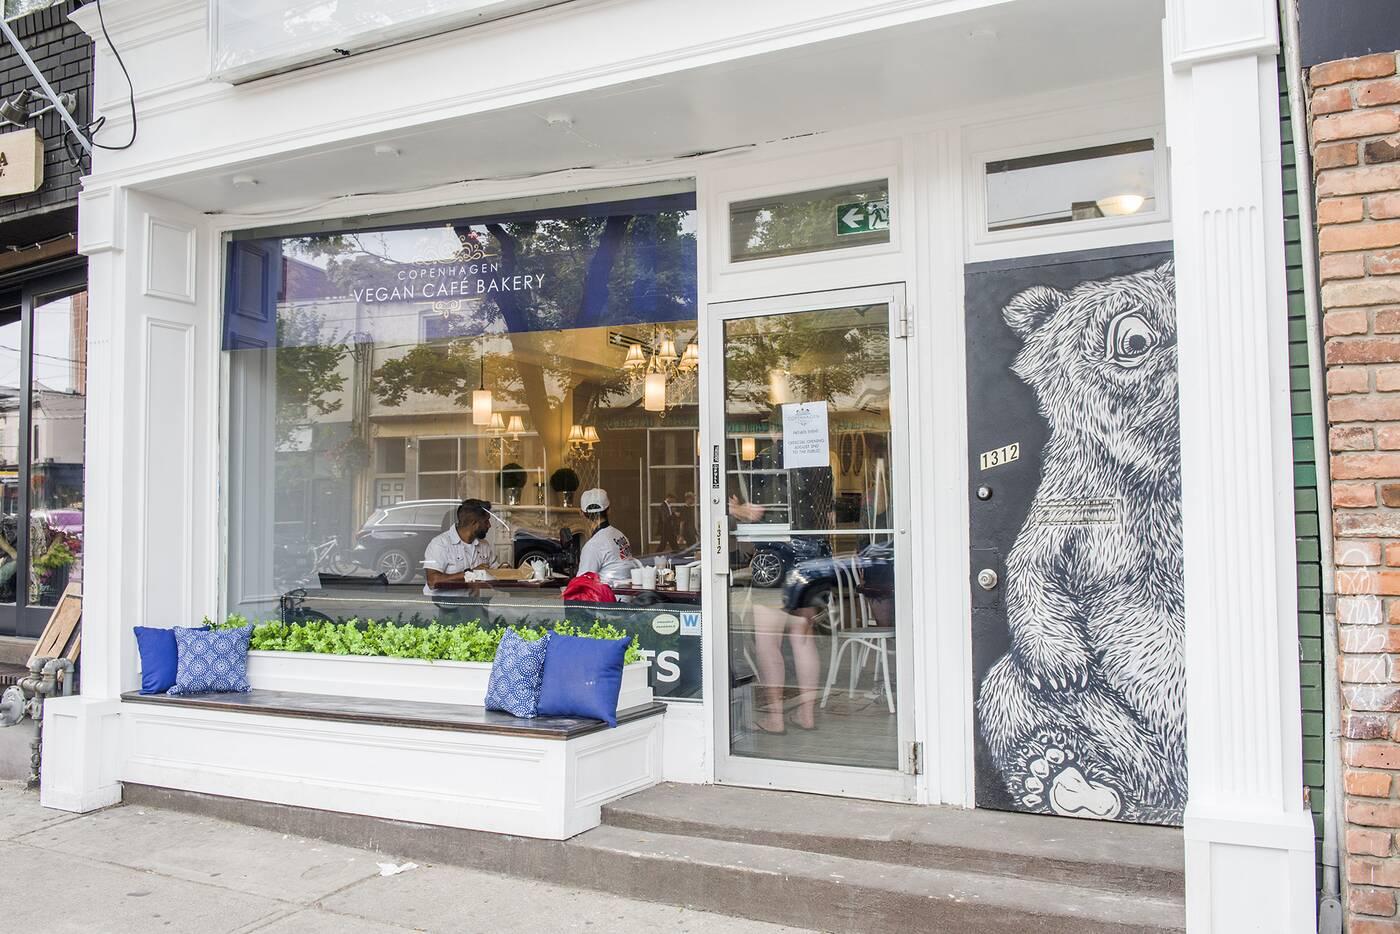 Copenhagen Vegan Cafe Toronto